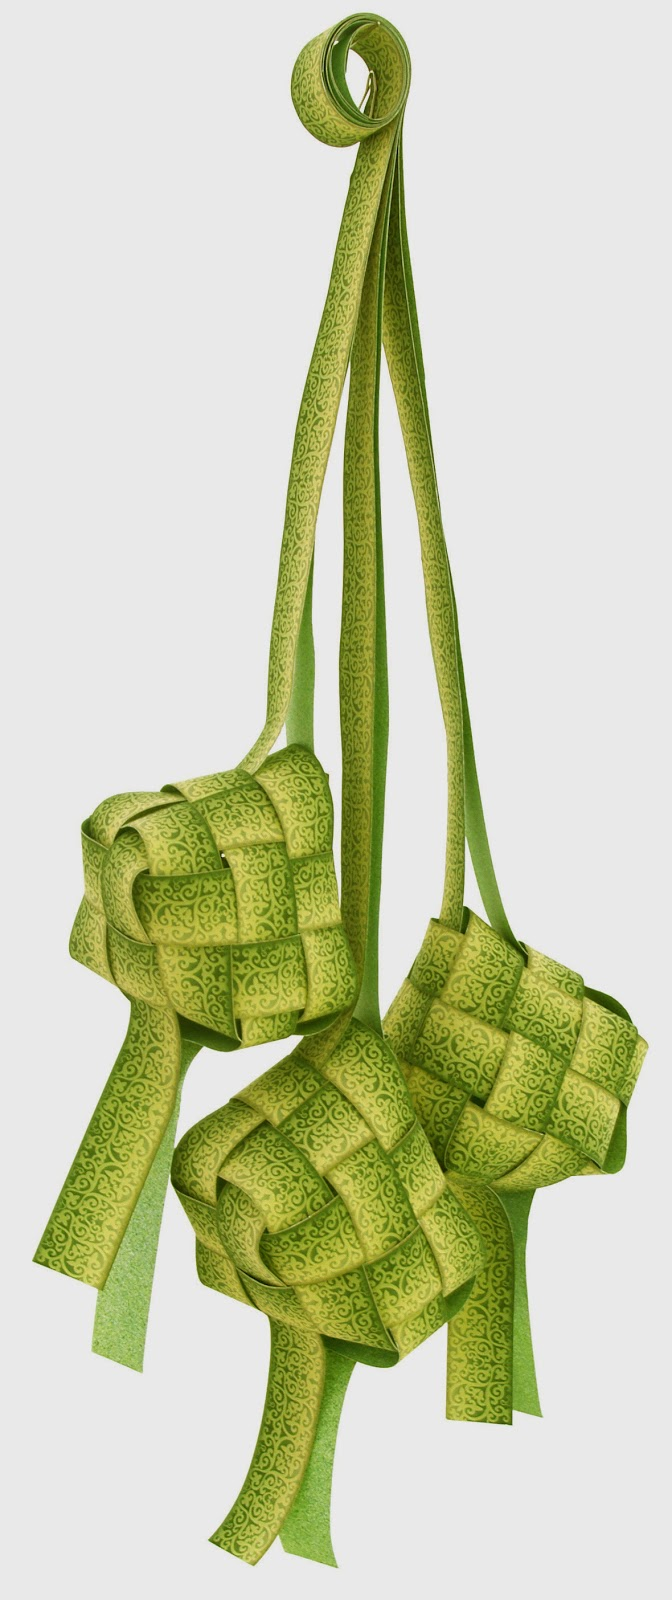 Ketupat, the most synonymous symbol with Hari Raya Festival